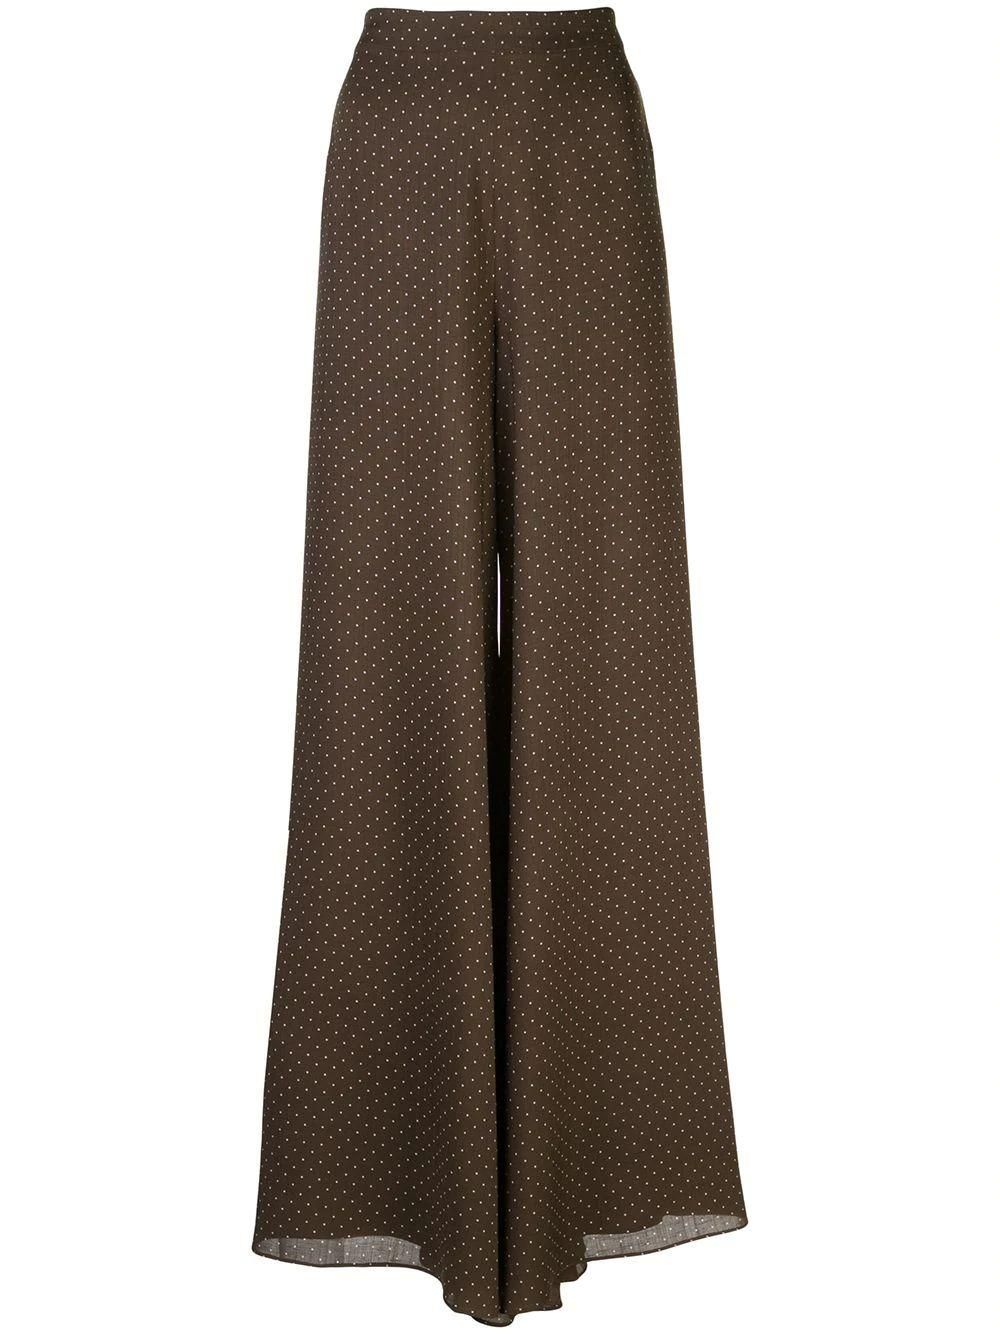 Antonin Linen Polka Dot Wide Leg Pant Item # A1200625-6202